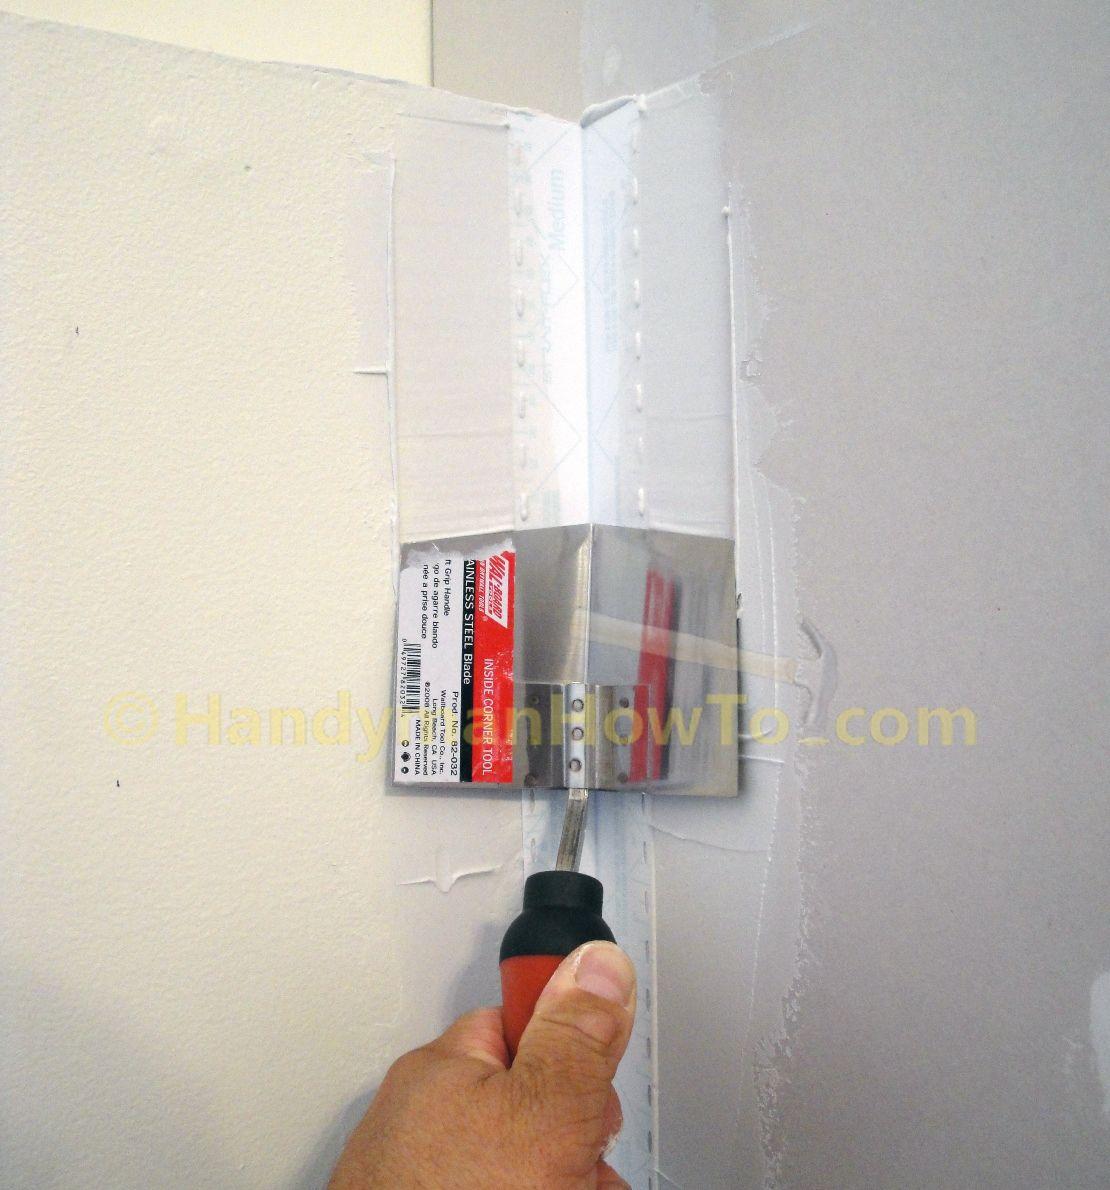 Basement Closet Drywall Finishing Drywall Finishing Basement Closet Drywall